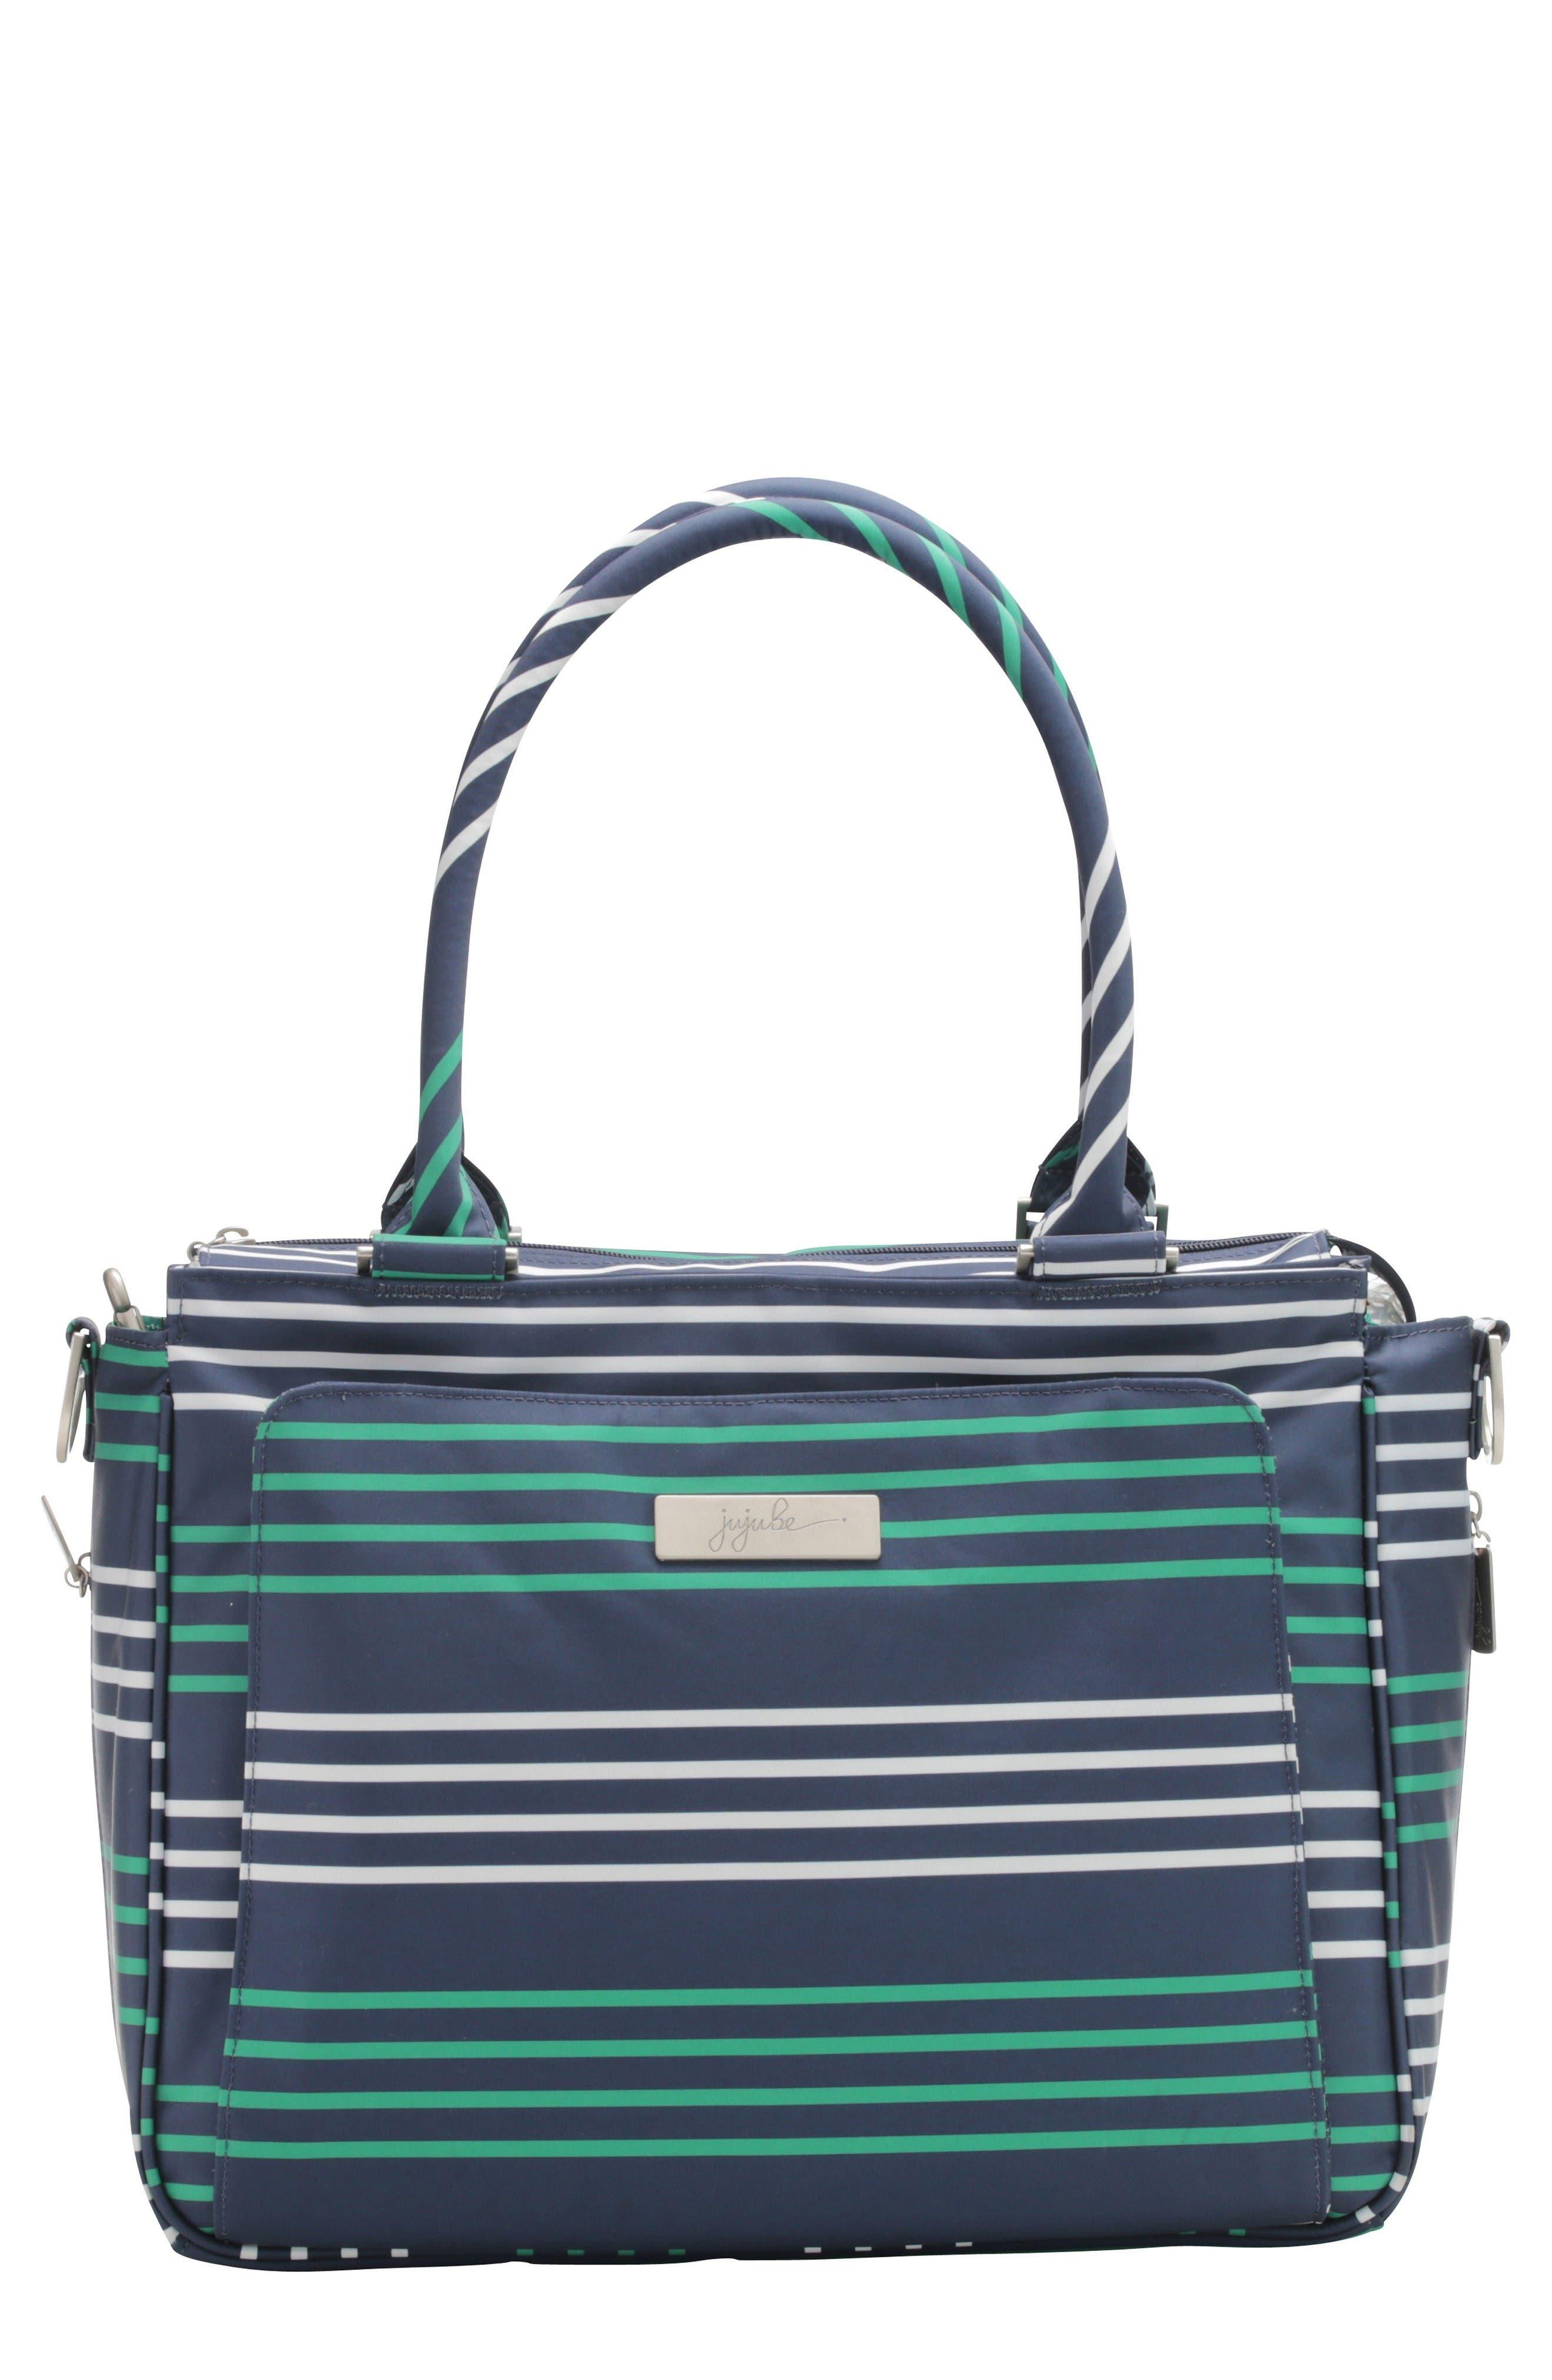 Ju-Ju-Be Be Classy - Coastal Collection Diaper Bag